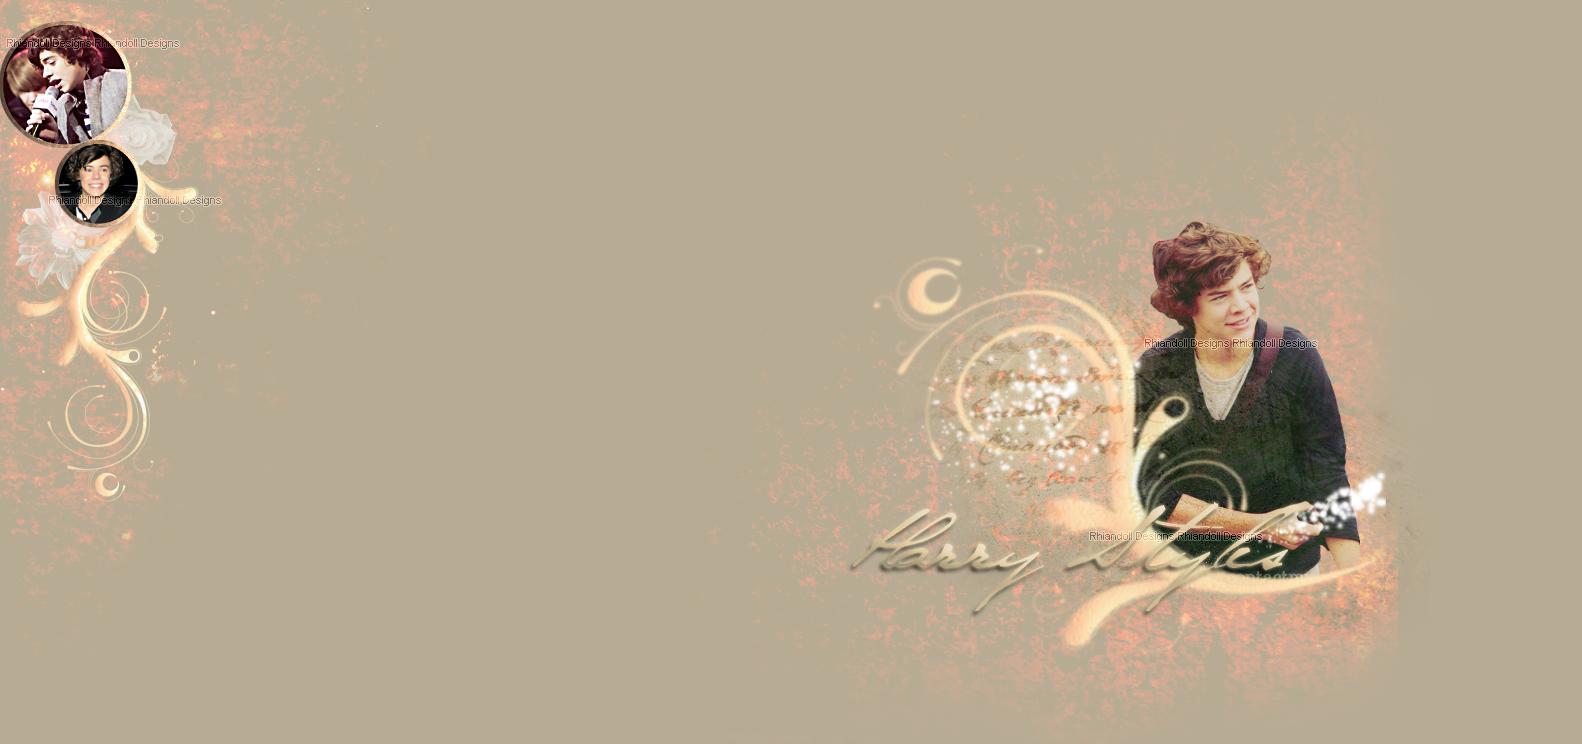 Free PSP Themes Wallpaper: Harry Styles - Harry Styles ...